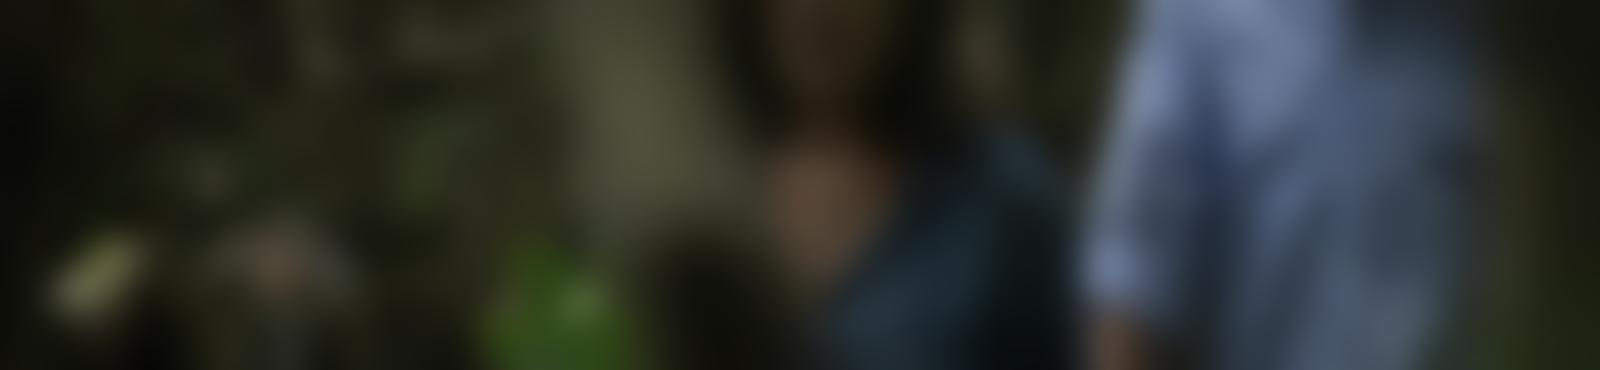 Blurred 0ac78976 77a9 4274 9d57 8f40dbfac9ea